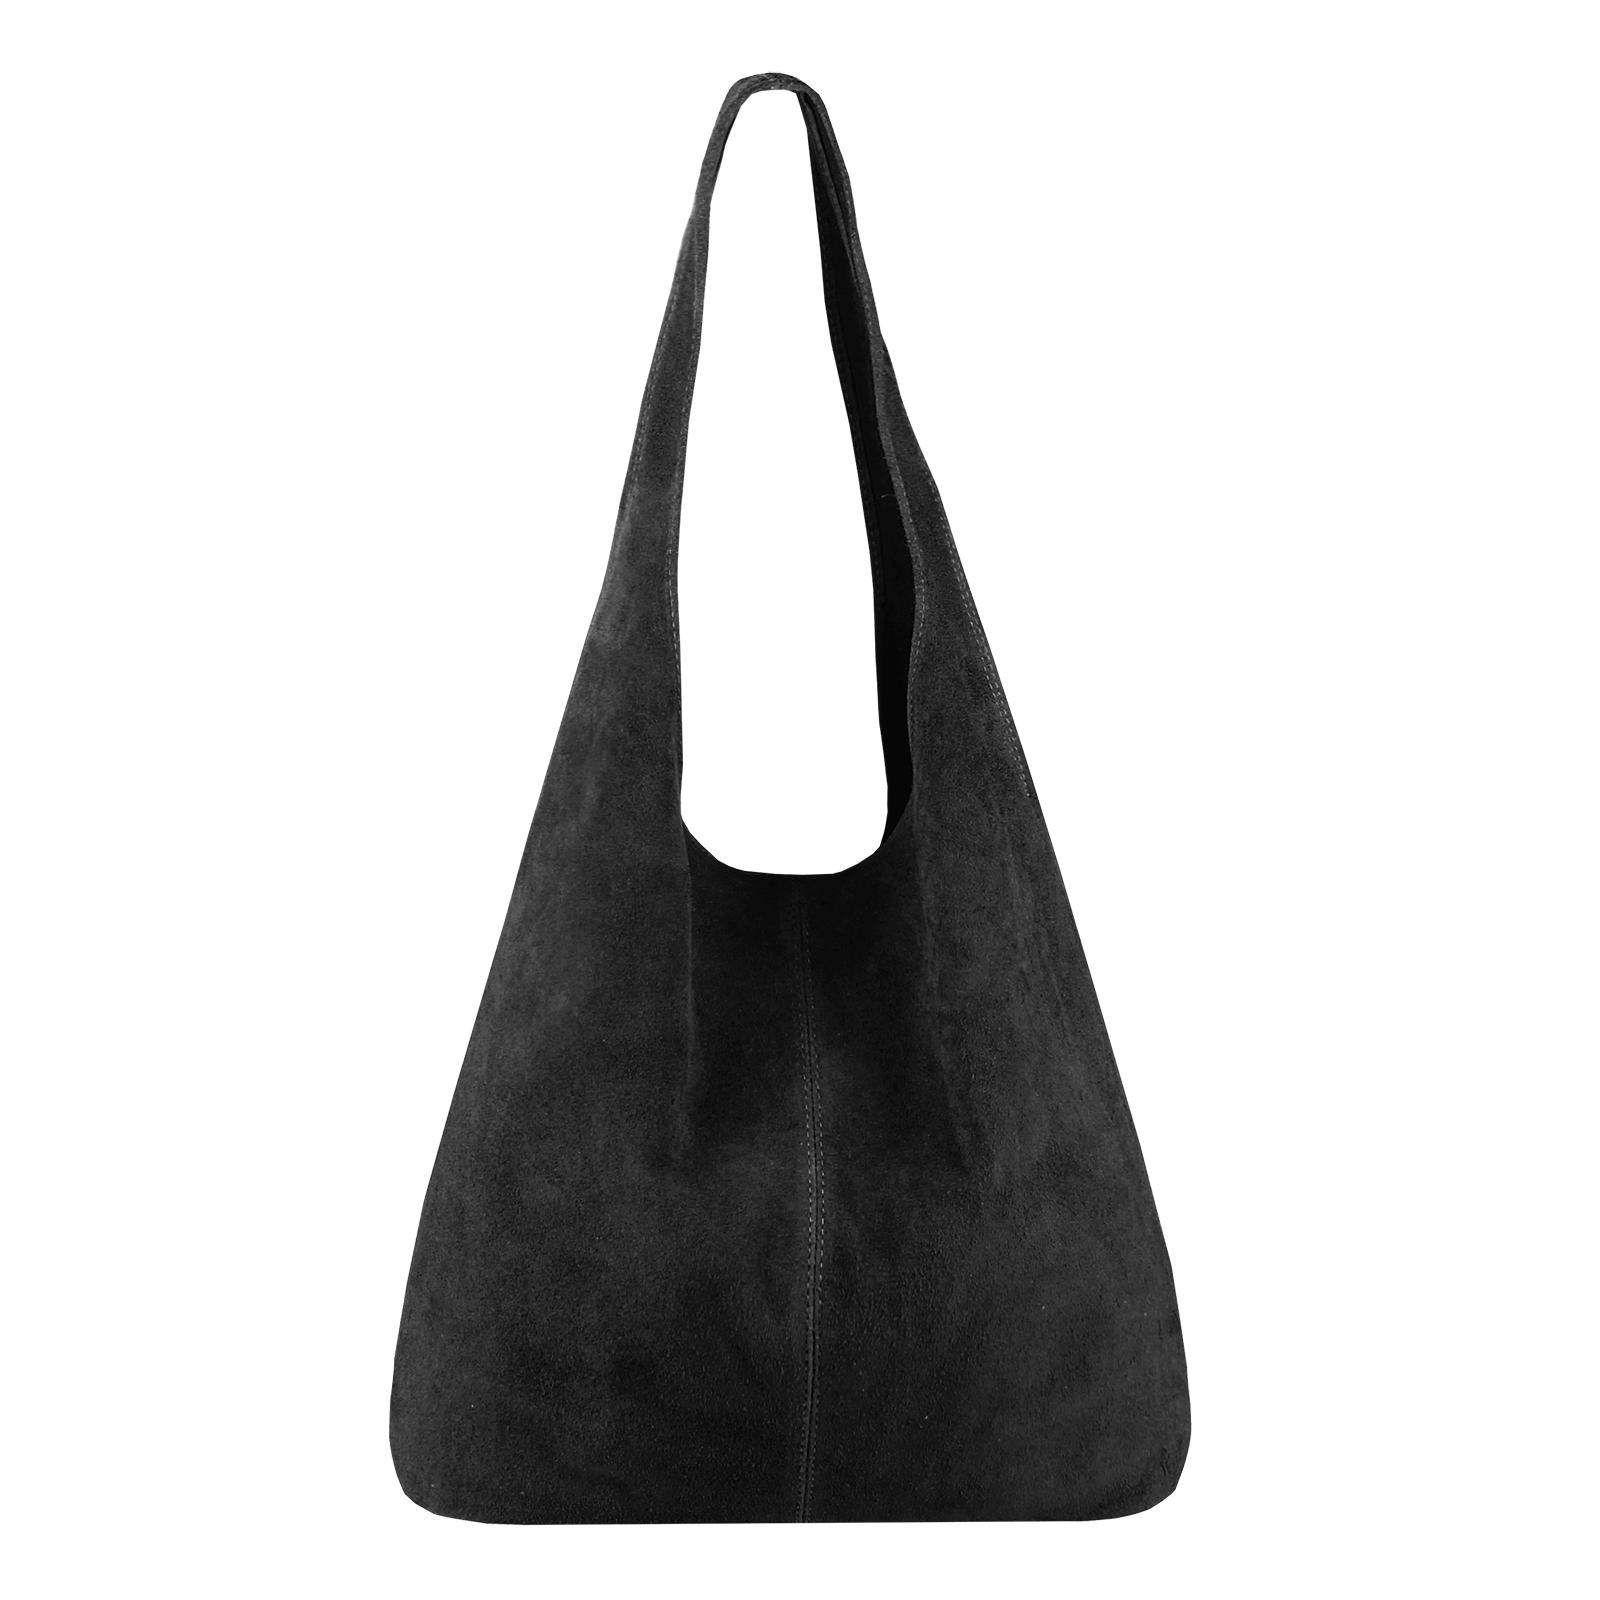 f7a7a10ed55696 MADE IN ITALY DAMEN LEDER TASCHE Handtasche Wildleder Shopper  Schultertasche Hobo-Bag Henkeltasche Beuteltasche Velourleder